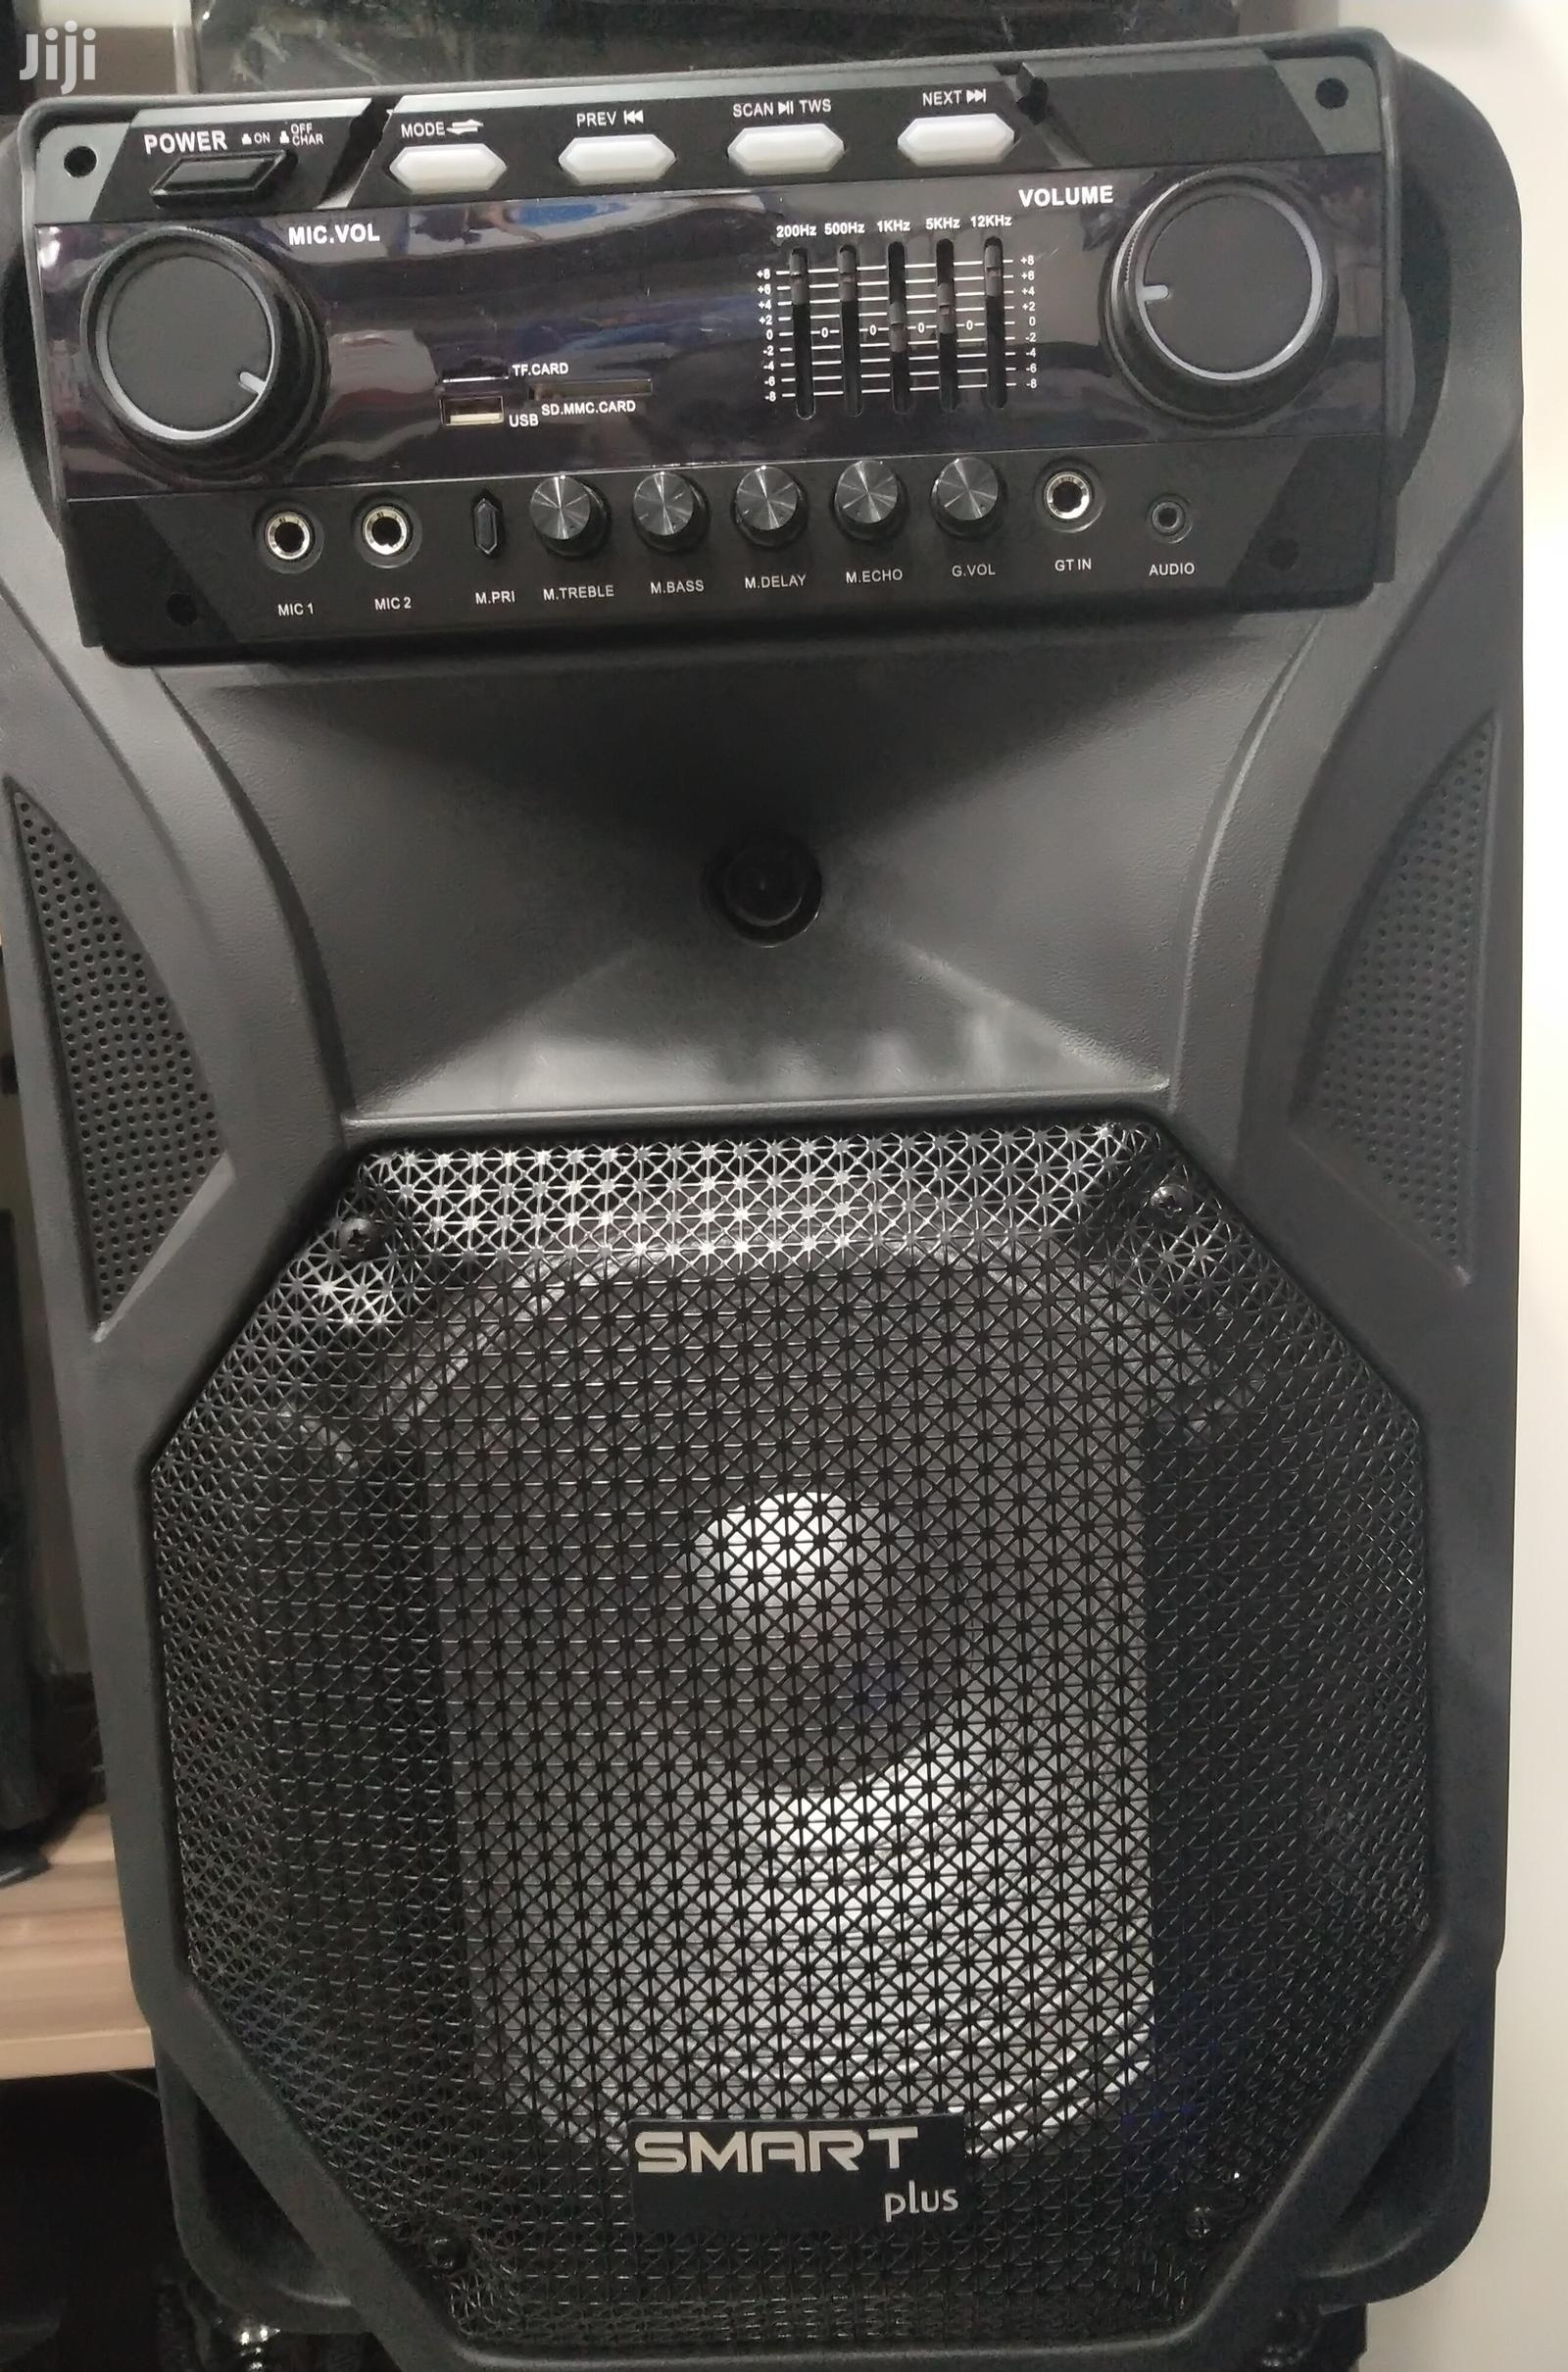 Rechargeable Wireless Microphone Speaker